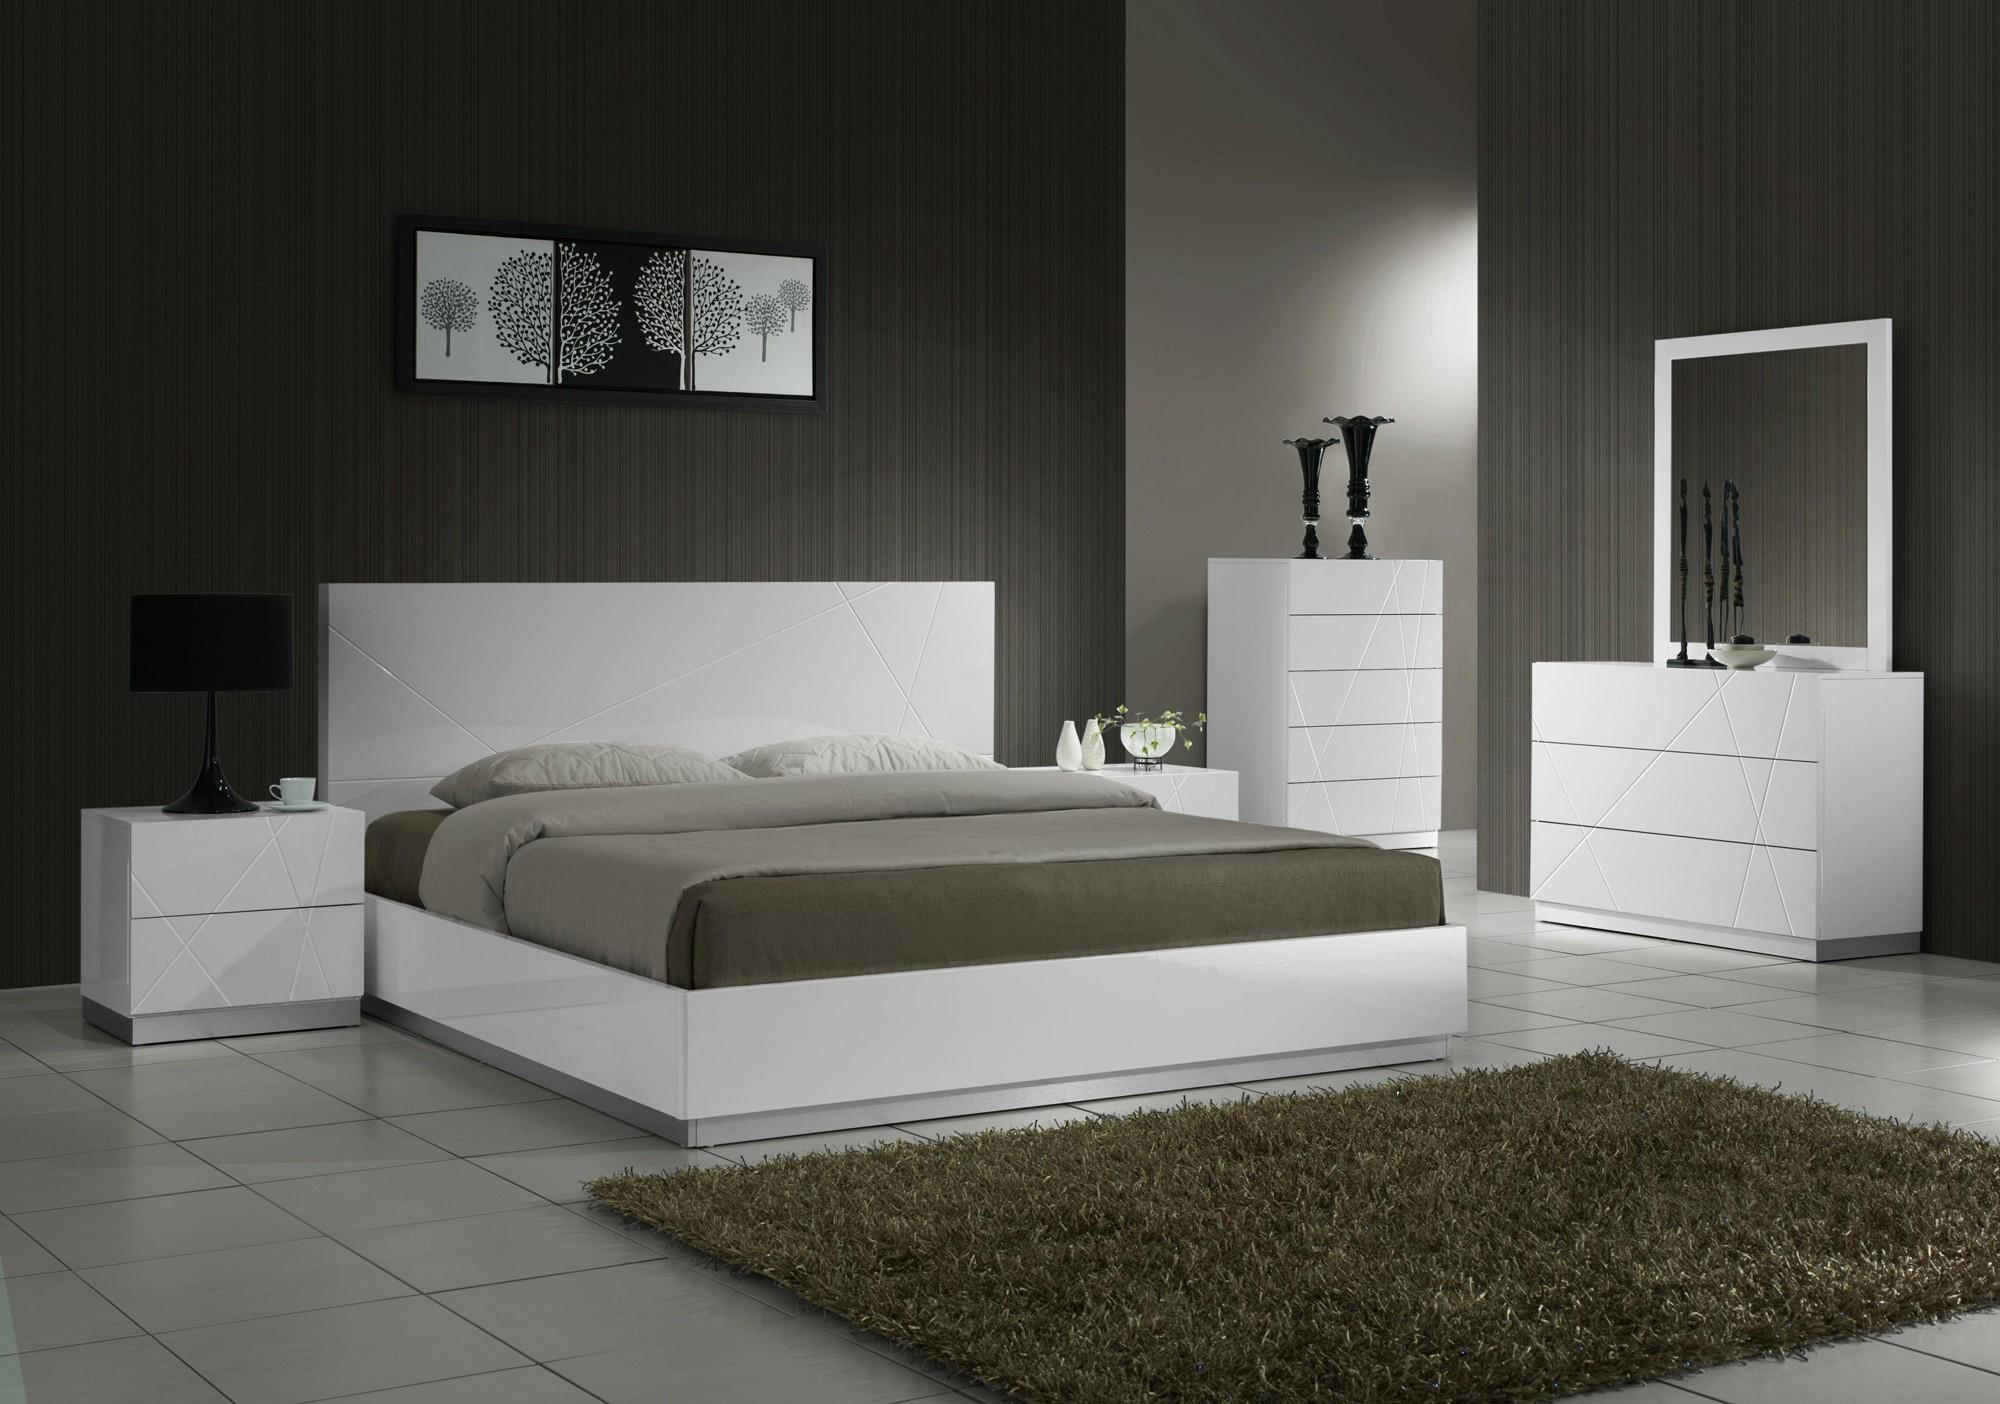 ikea high gloss bedroom furniture photo - 8